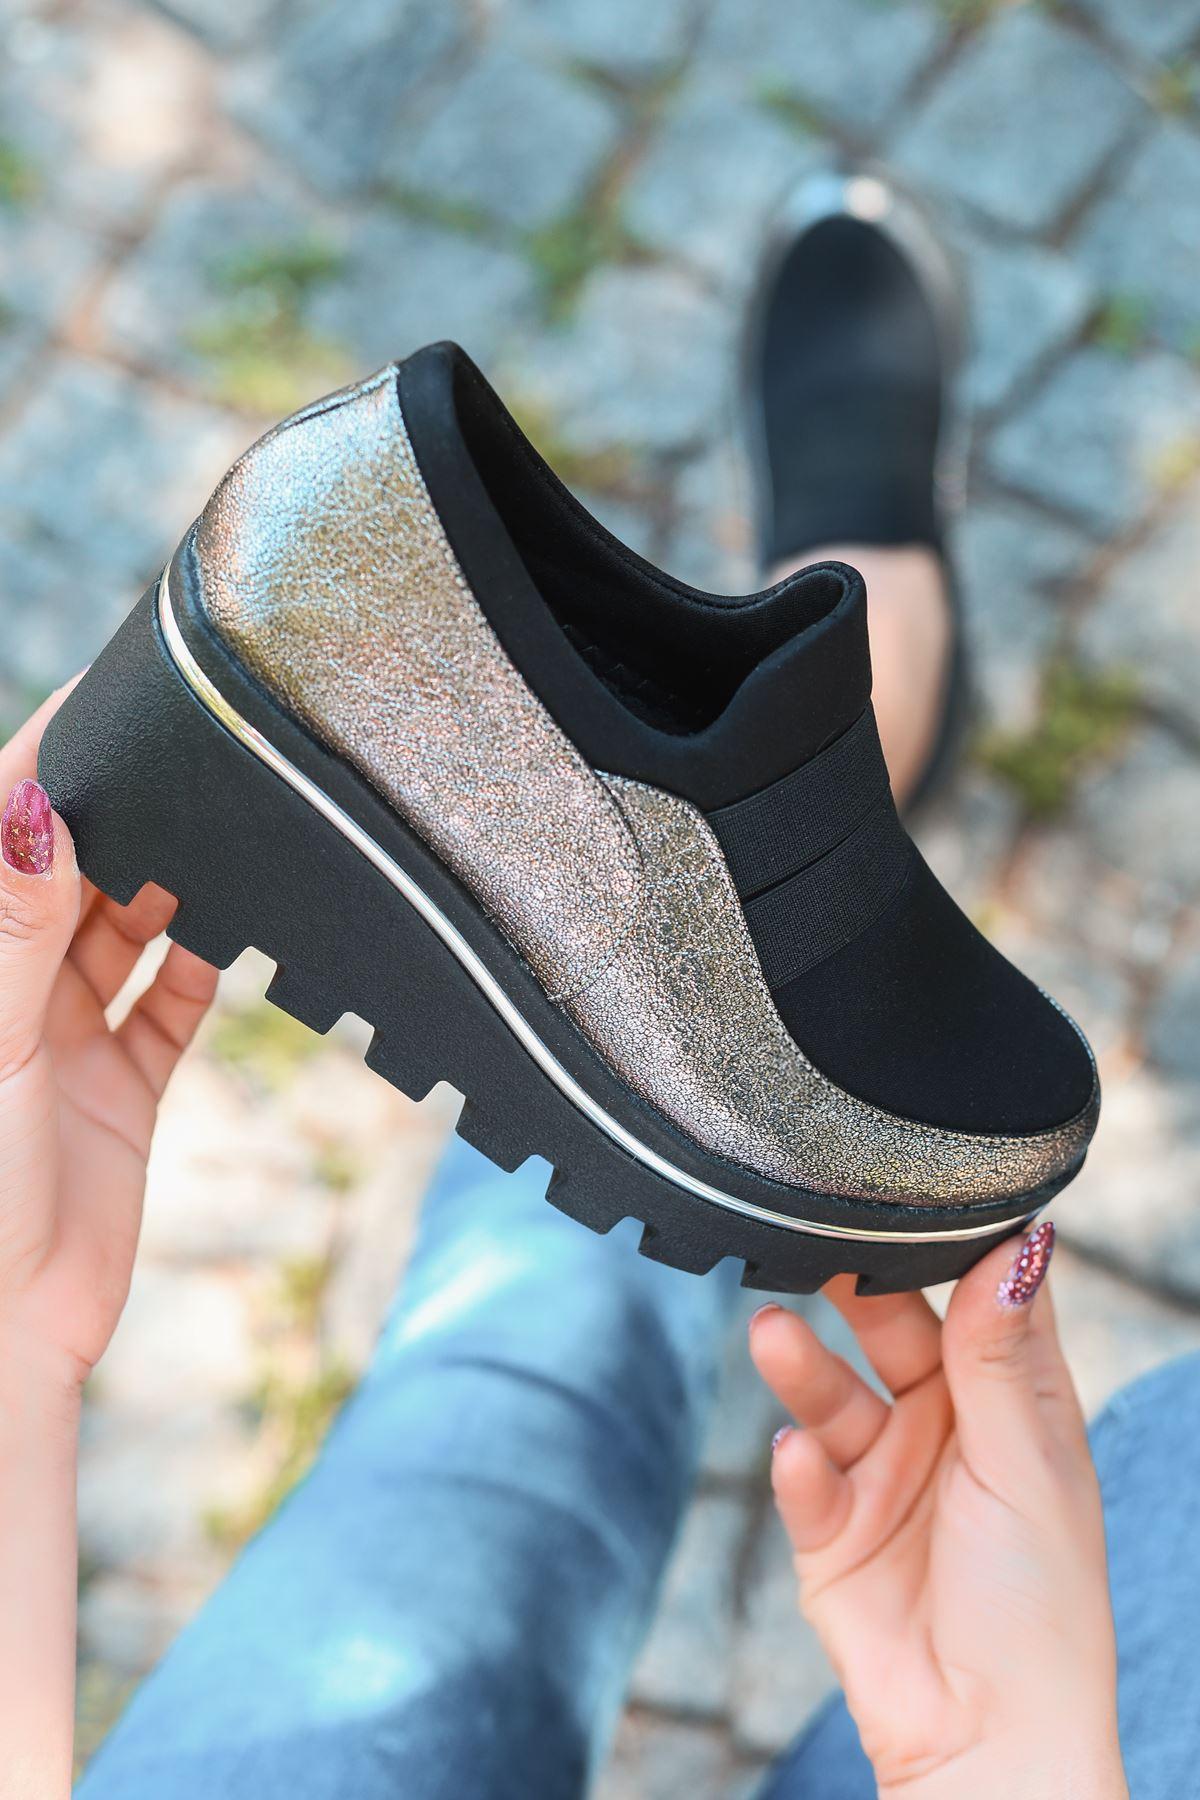 Bratz Lastik Detay Dolgu Topuk Ayakkabı Platin